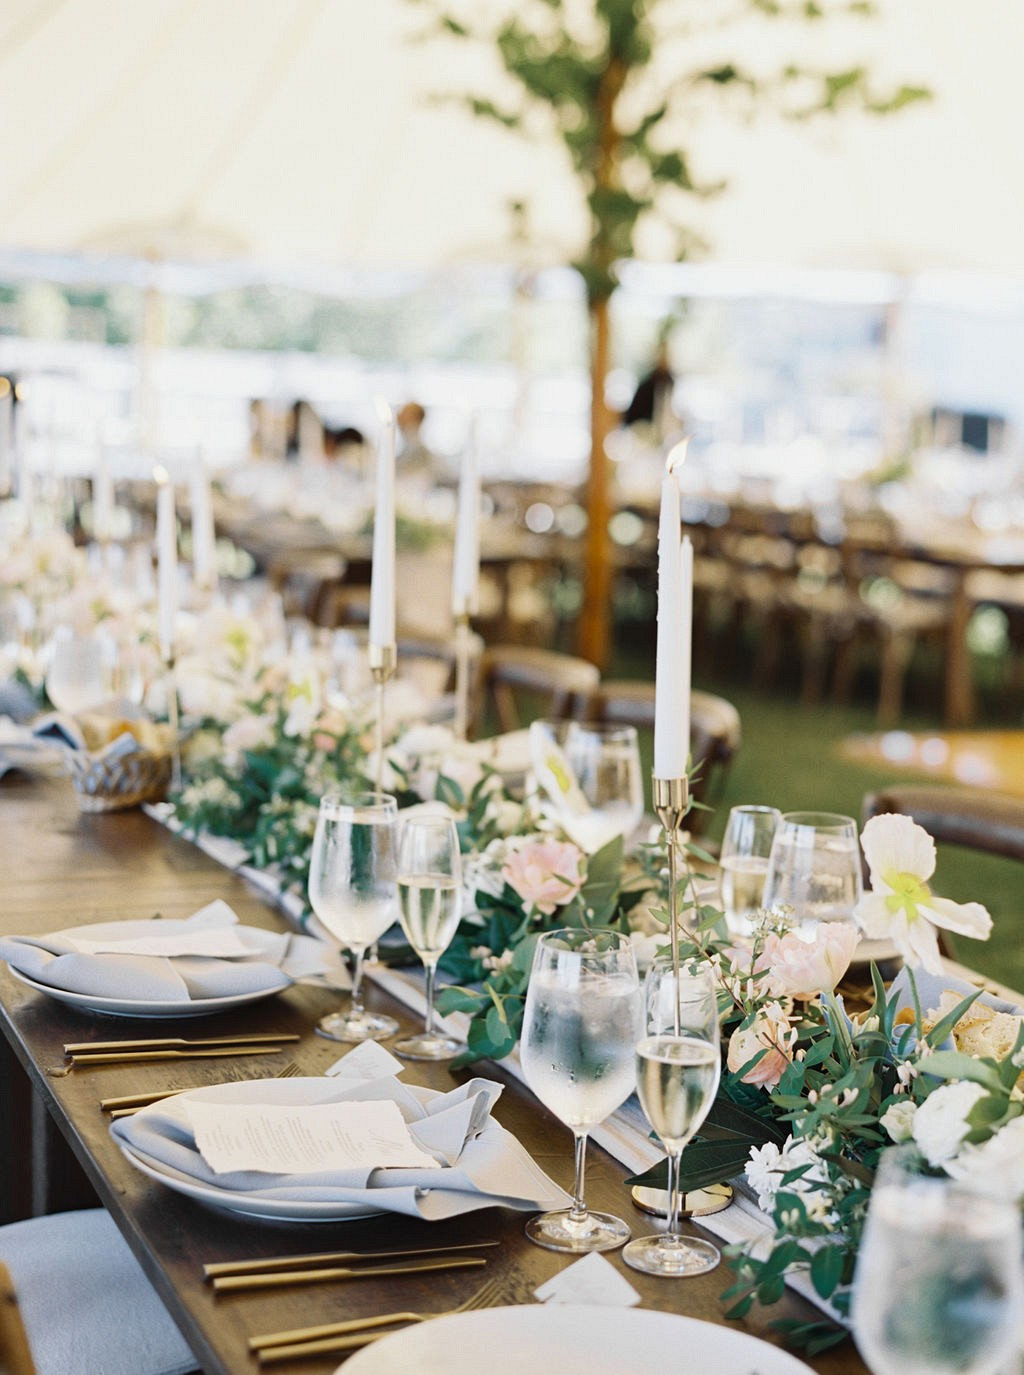 A Fresh & Elegant Seaside Celebration with Succulent Favors